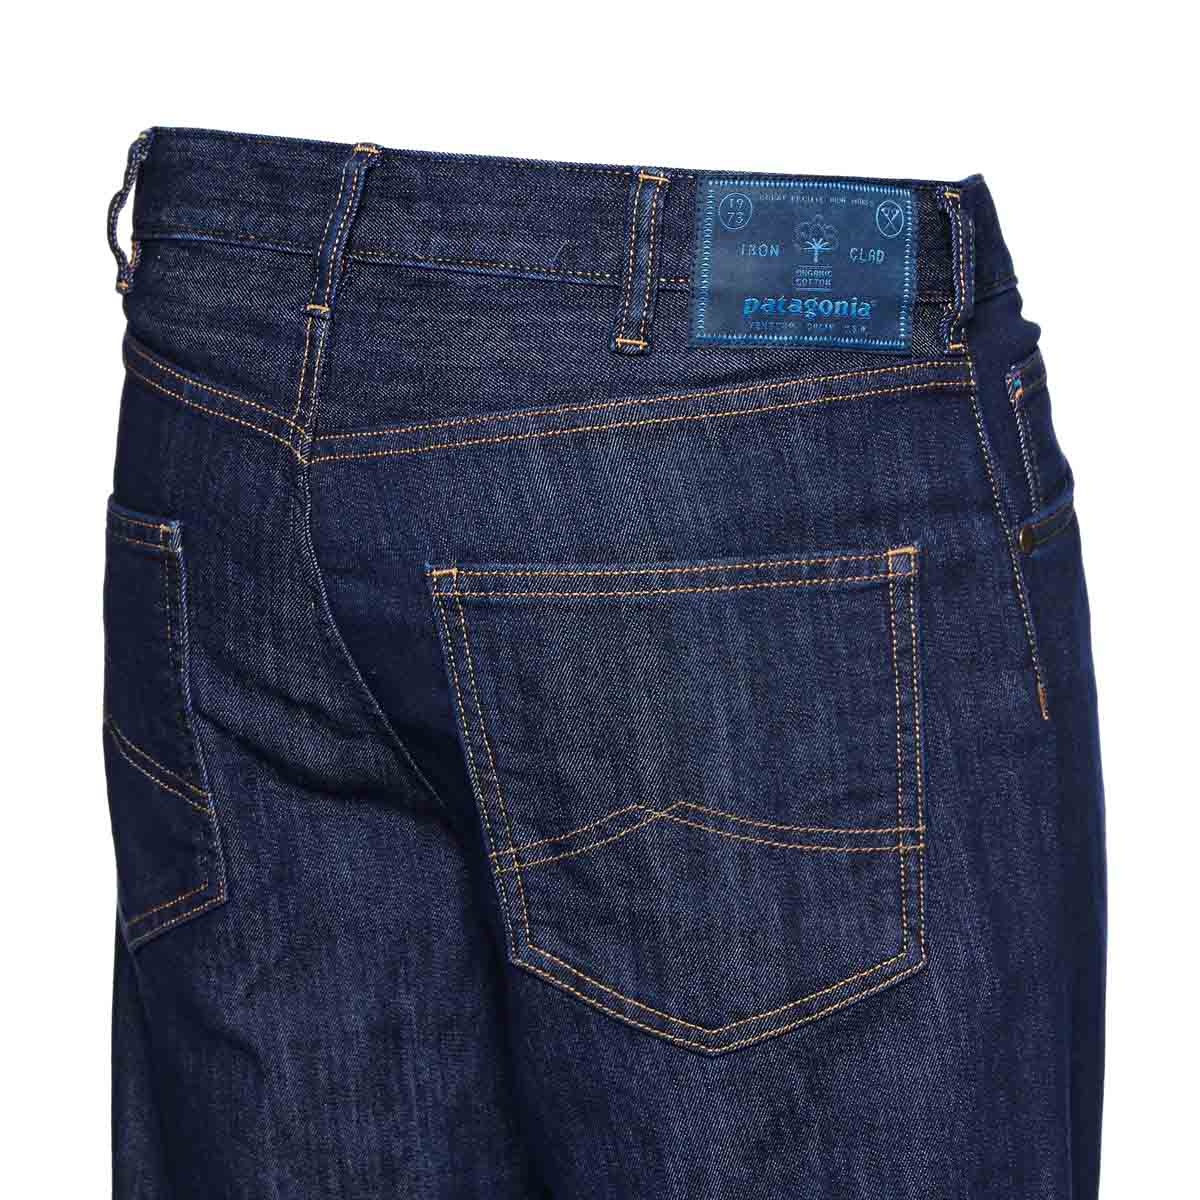 timeless design d9f6e 1105b Patagonia Performance Straight Fit Jeans Reg Dark Denim - The Sporting Lodge